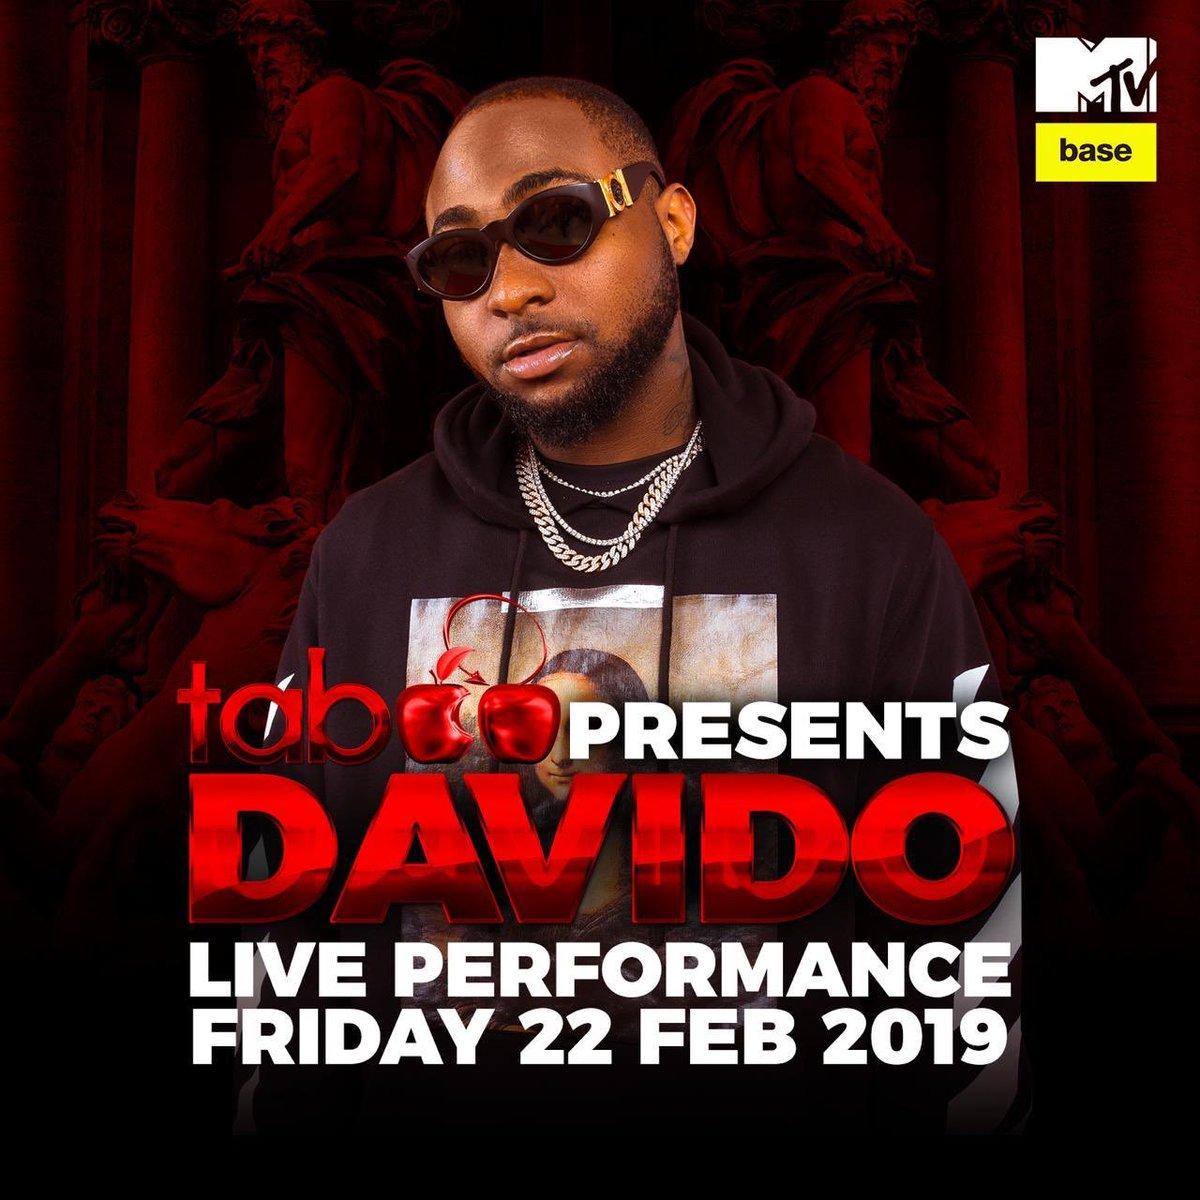 DJ Maphorisa and Davido to perform at Taboo tonight